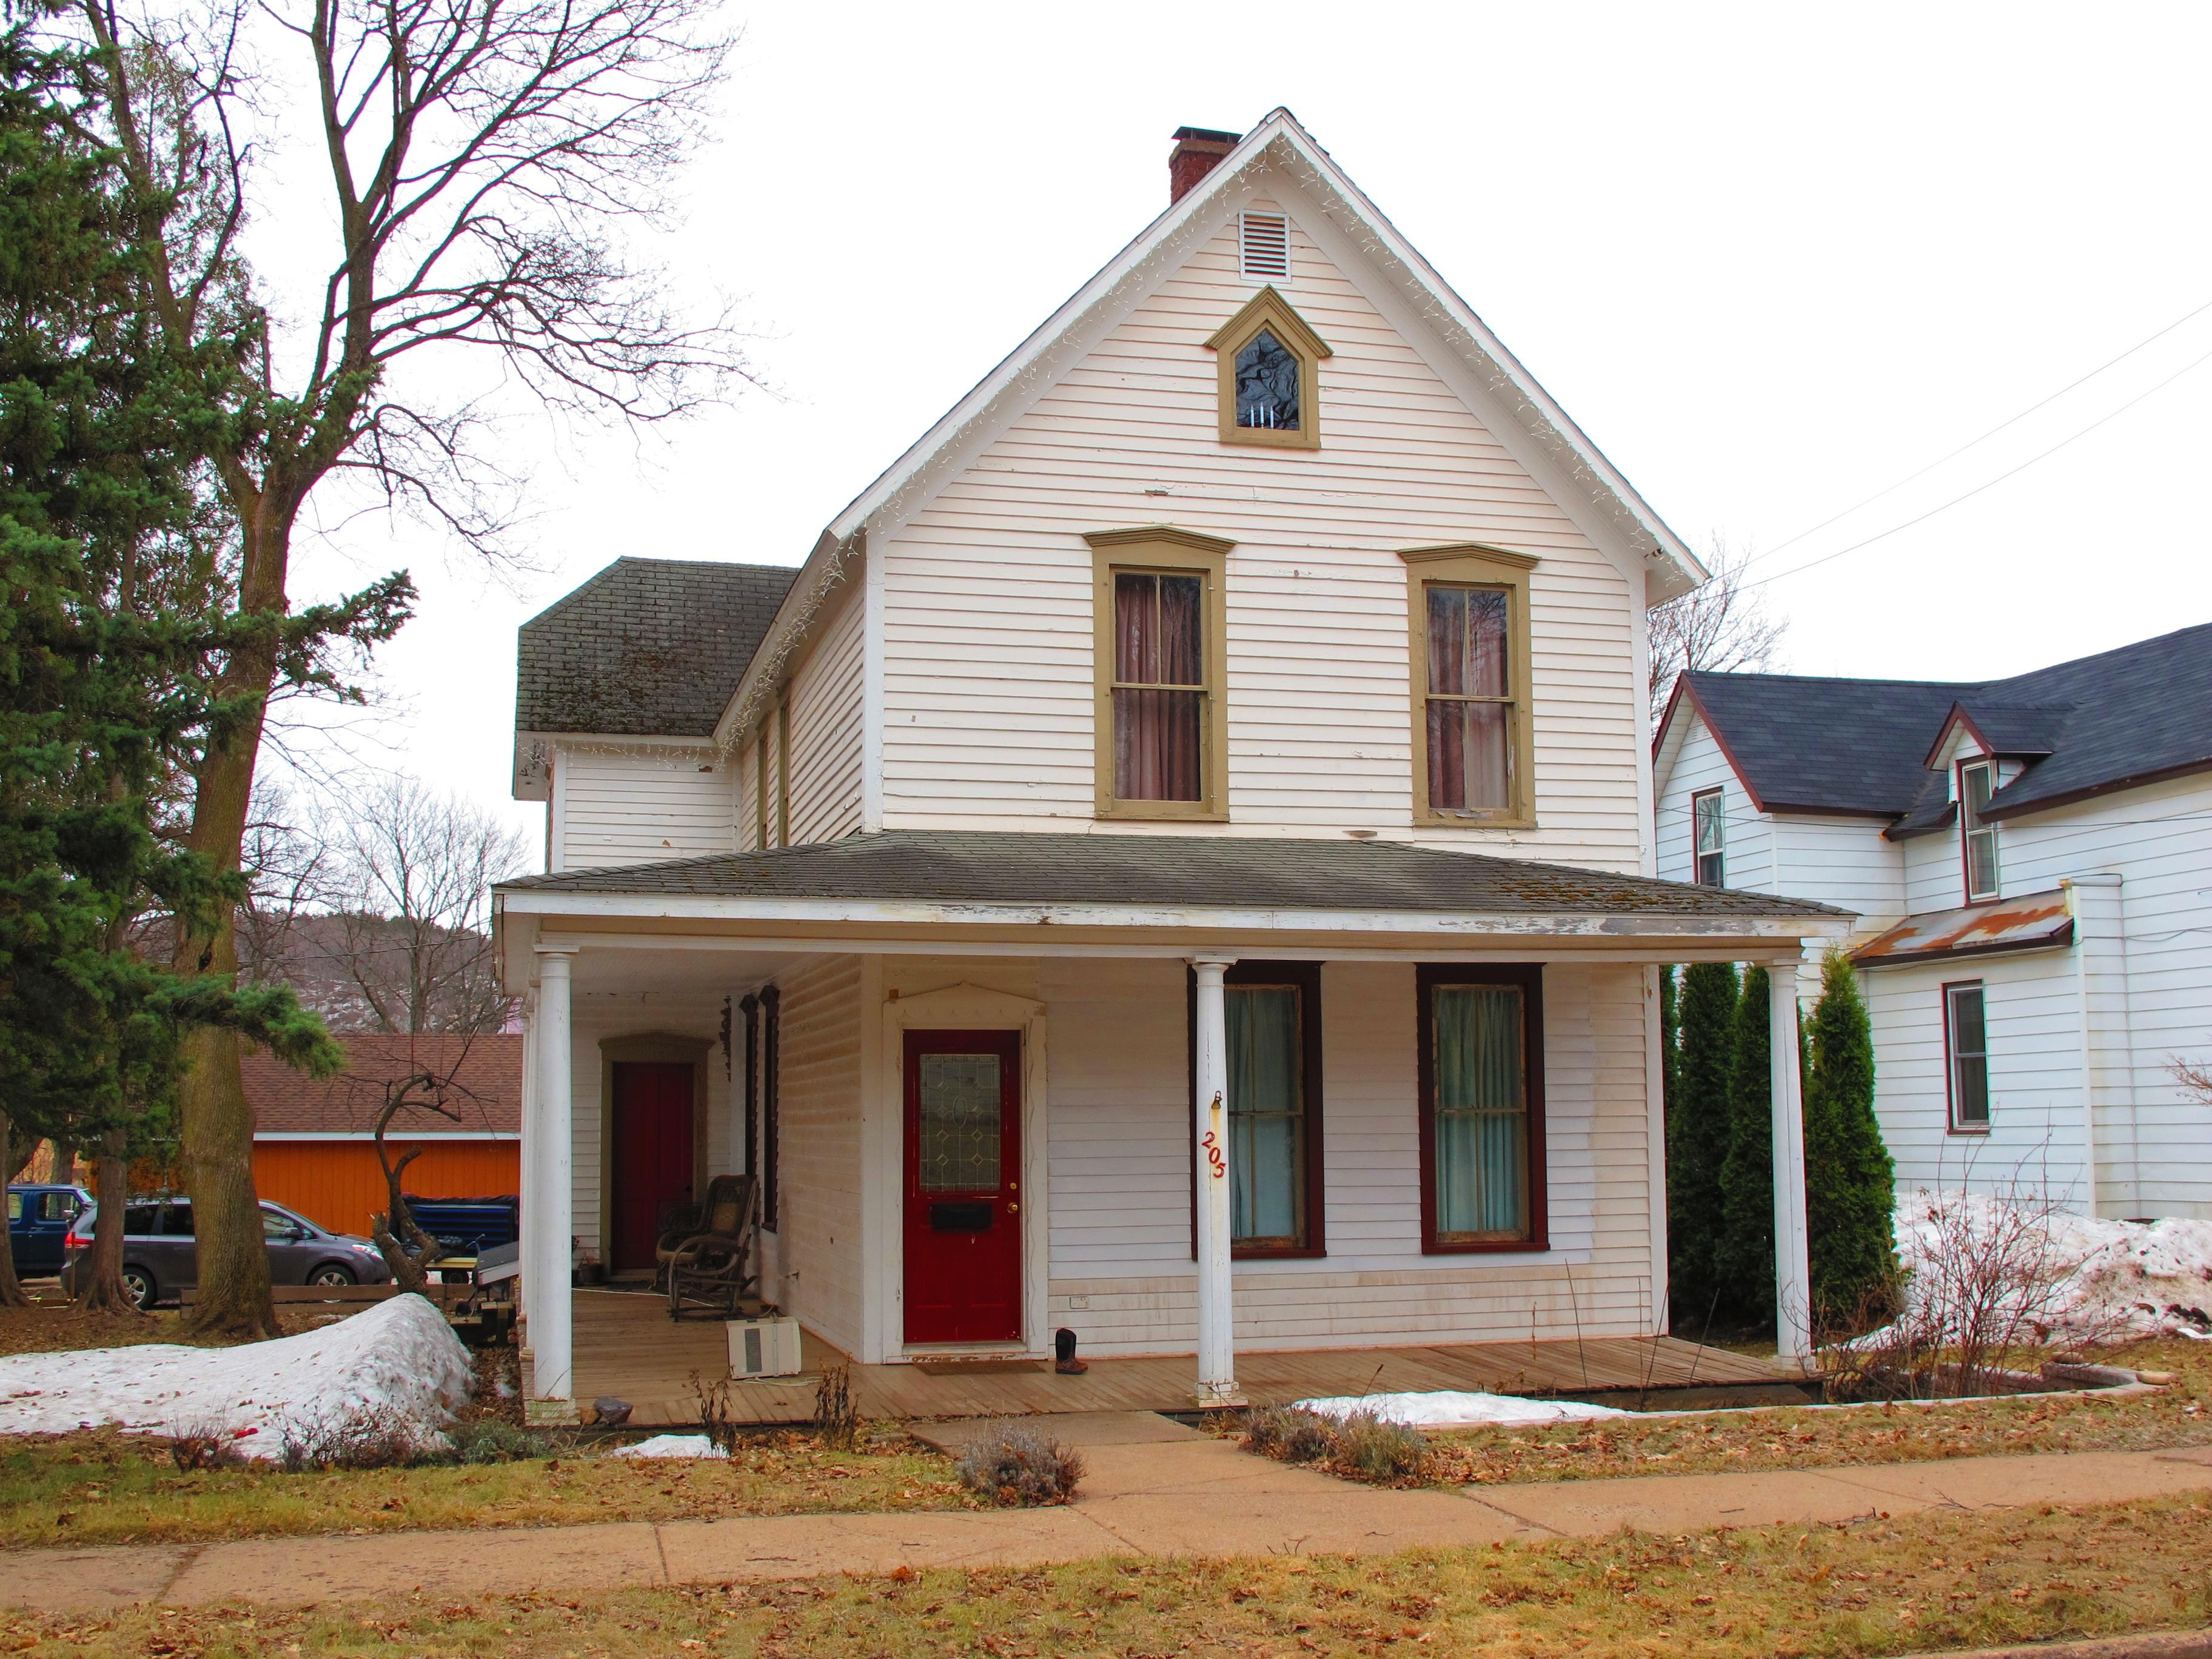 File:Ishpeming, Michigan - Paul Biegler\'s house in Anatomy of a ...